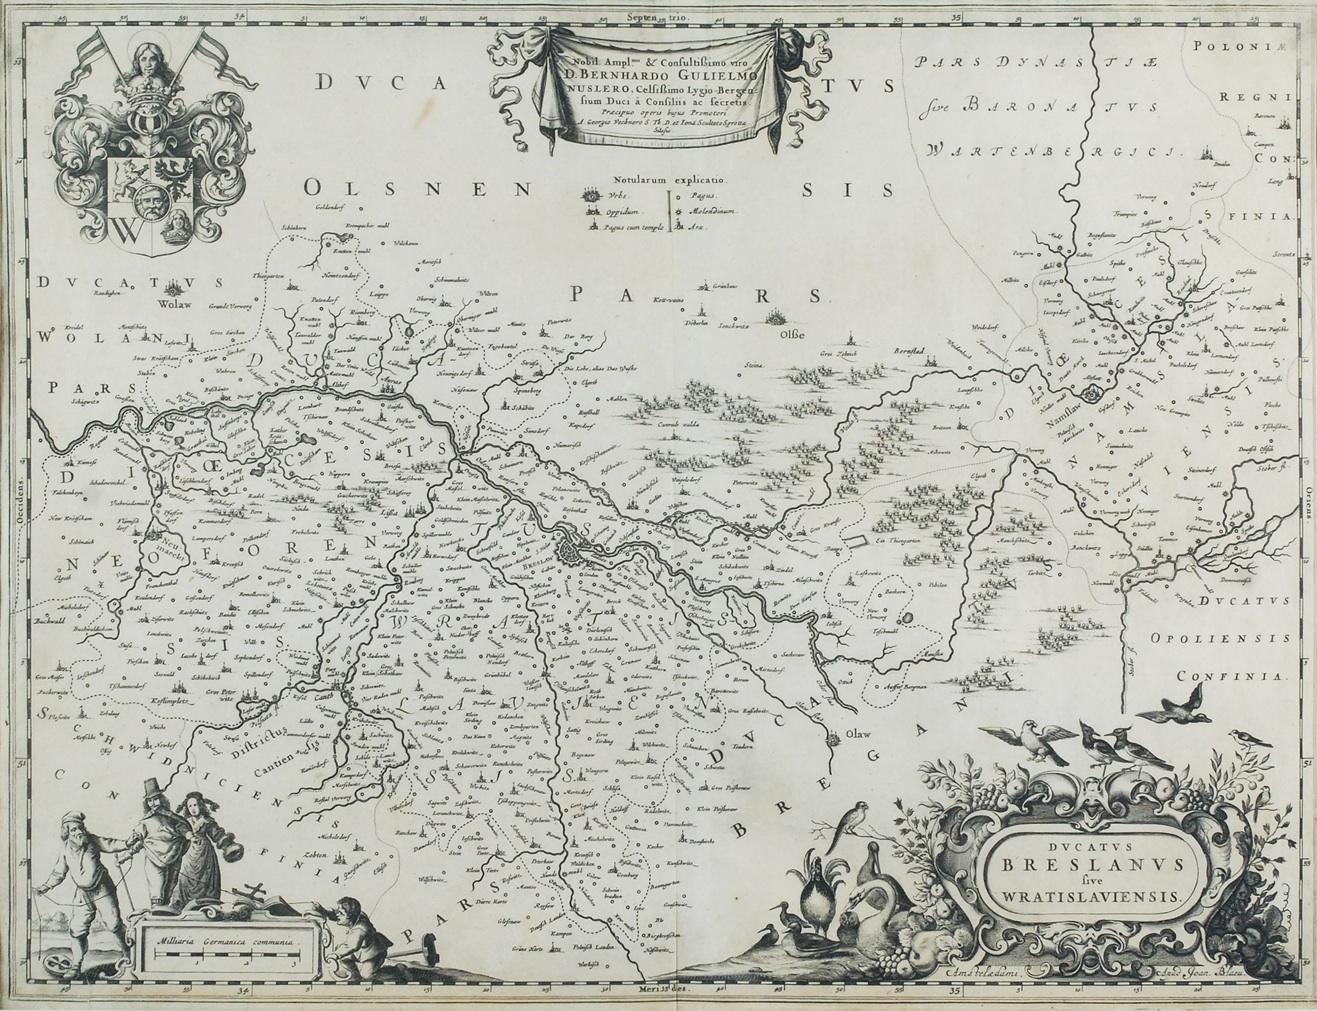 GEORG VECHNER (vel FECHNER) der Jűngere (1590)